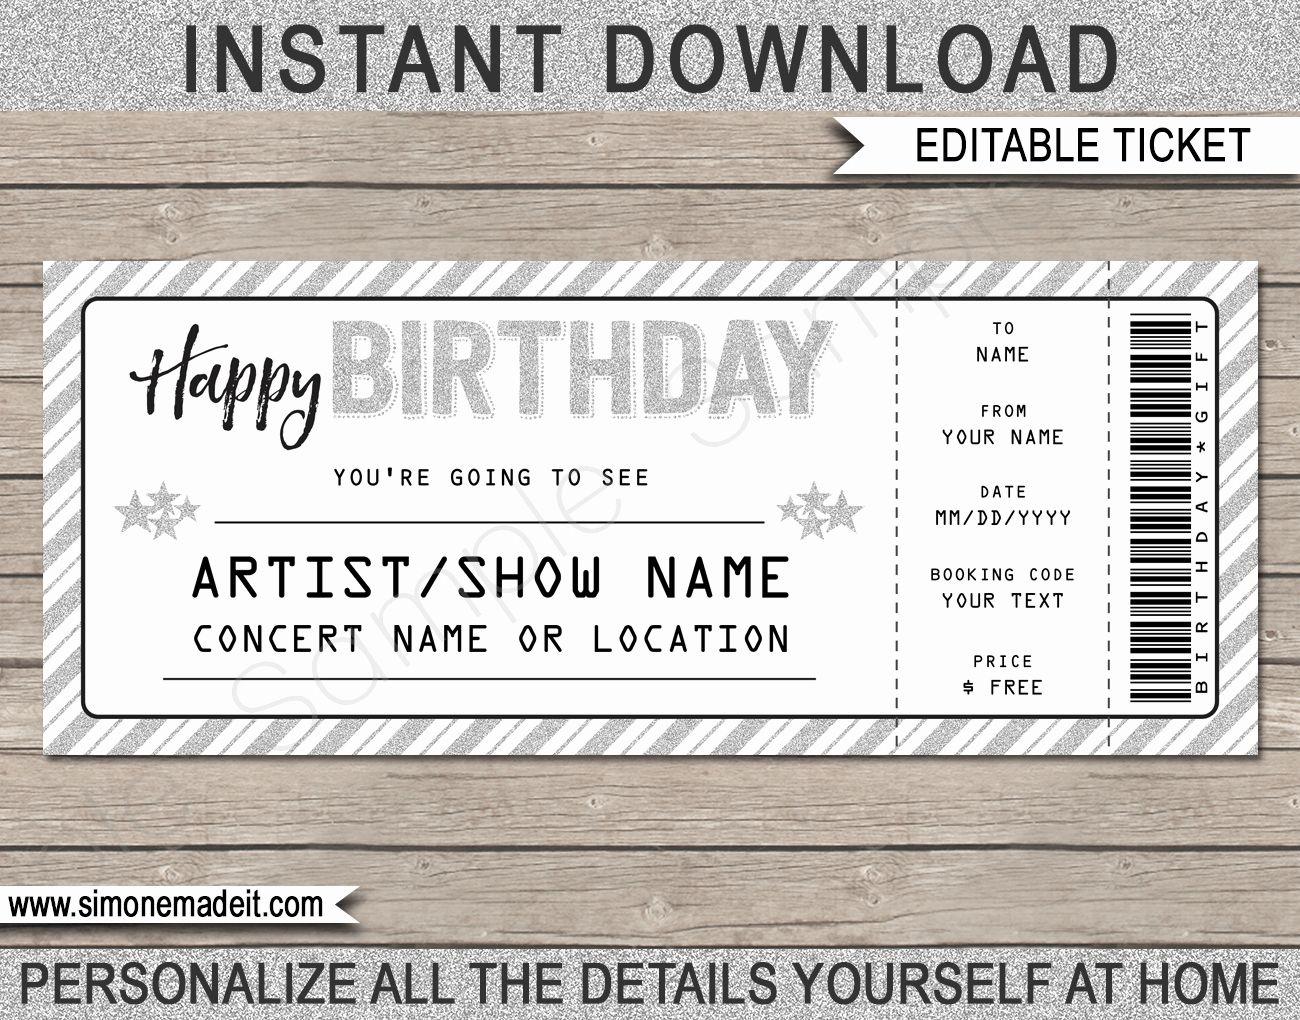 Concert Ticket Birthday Invitation Template Elegant Printable Concert Ticket Temp Concert Ticket Template Ticket Invitation Birthday Concert Ticket Invitations